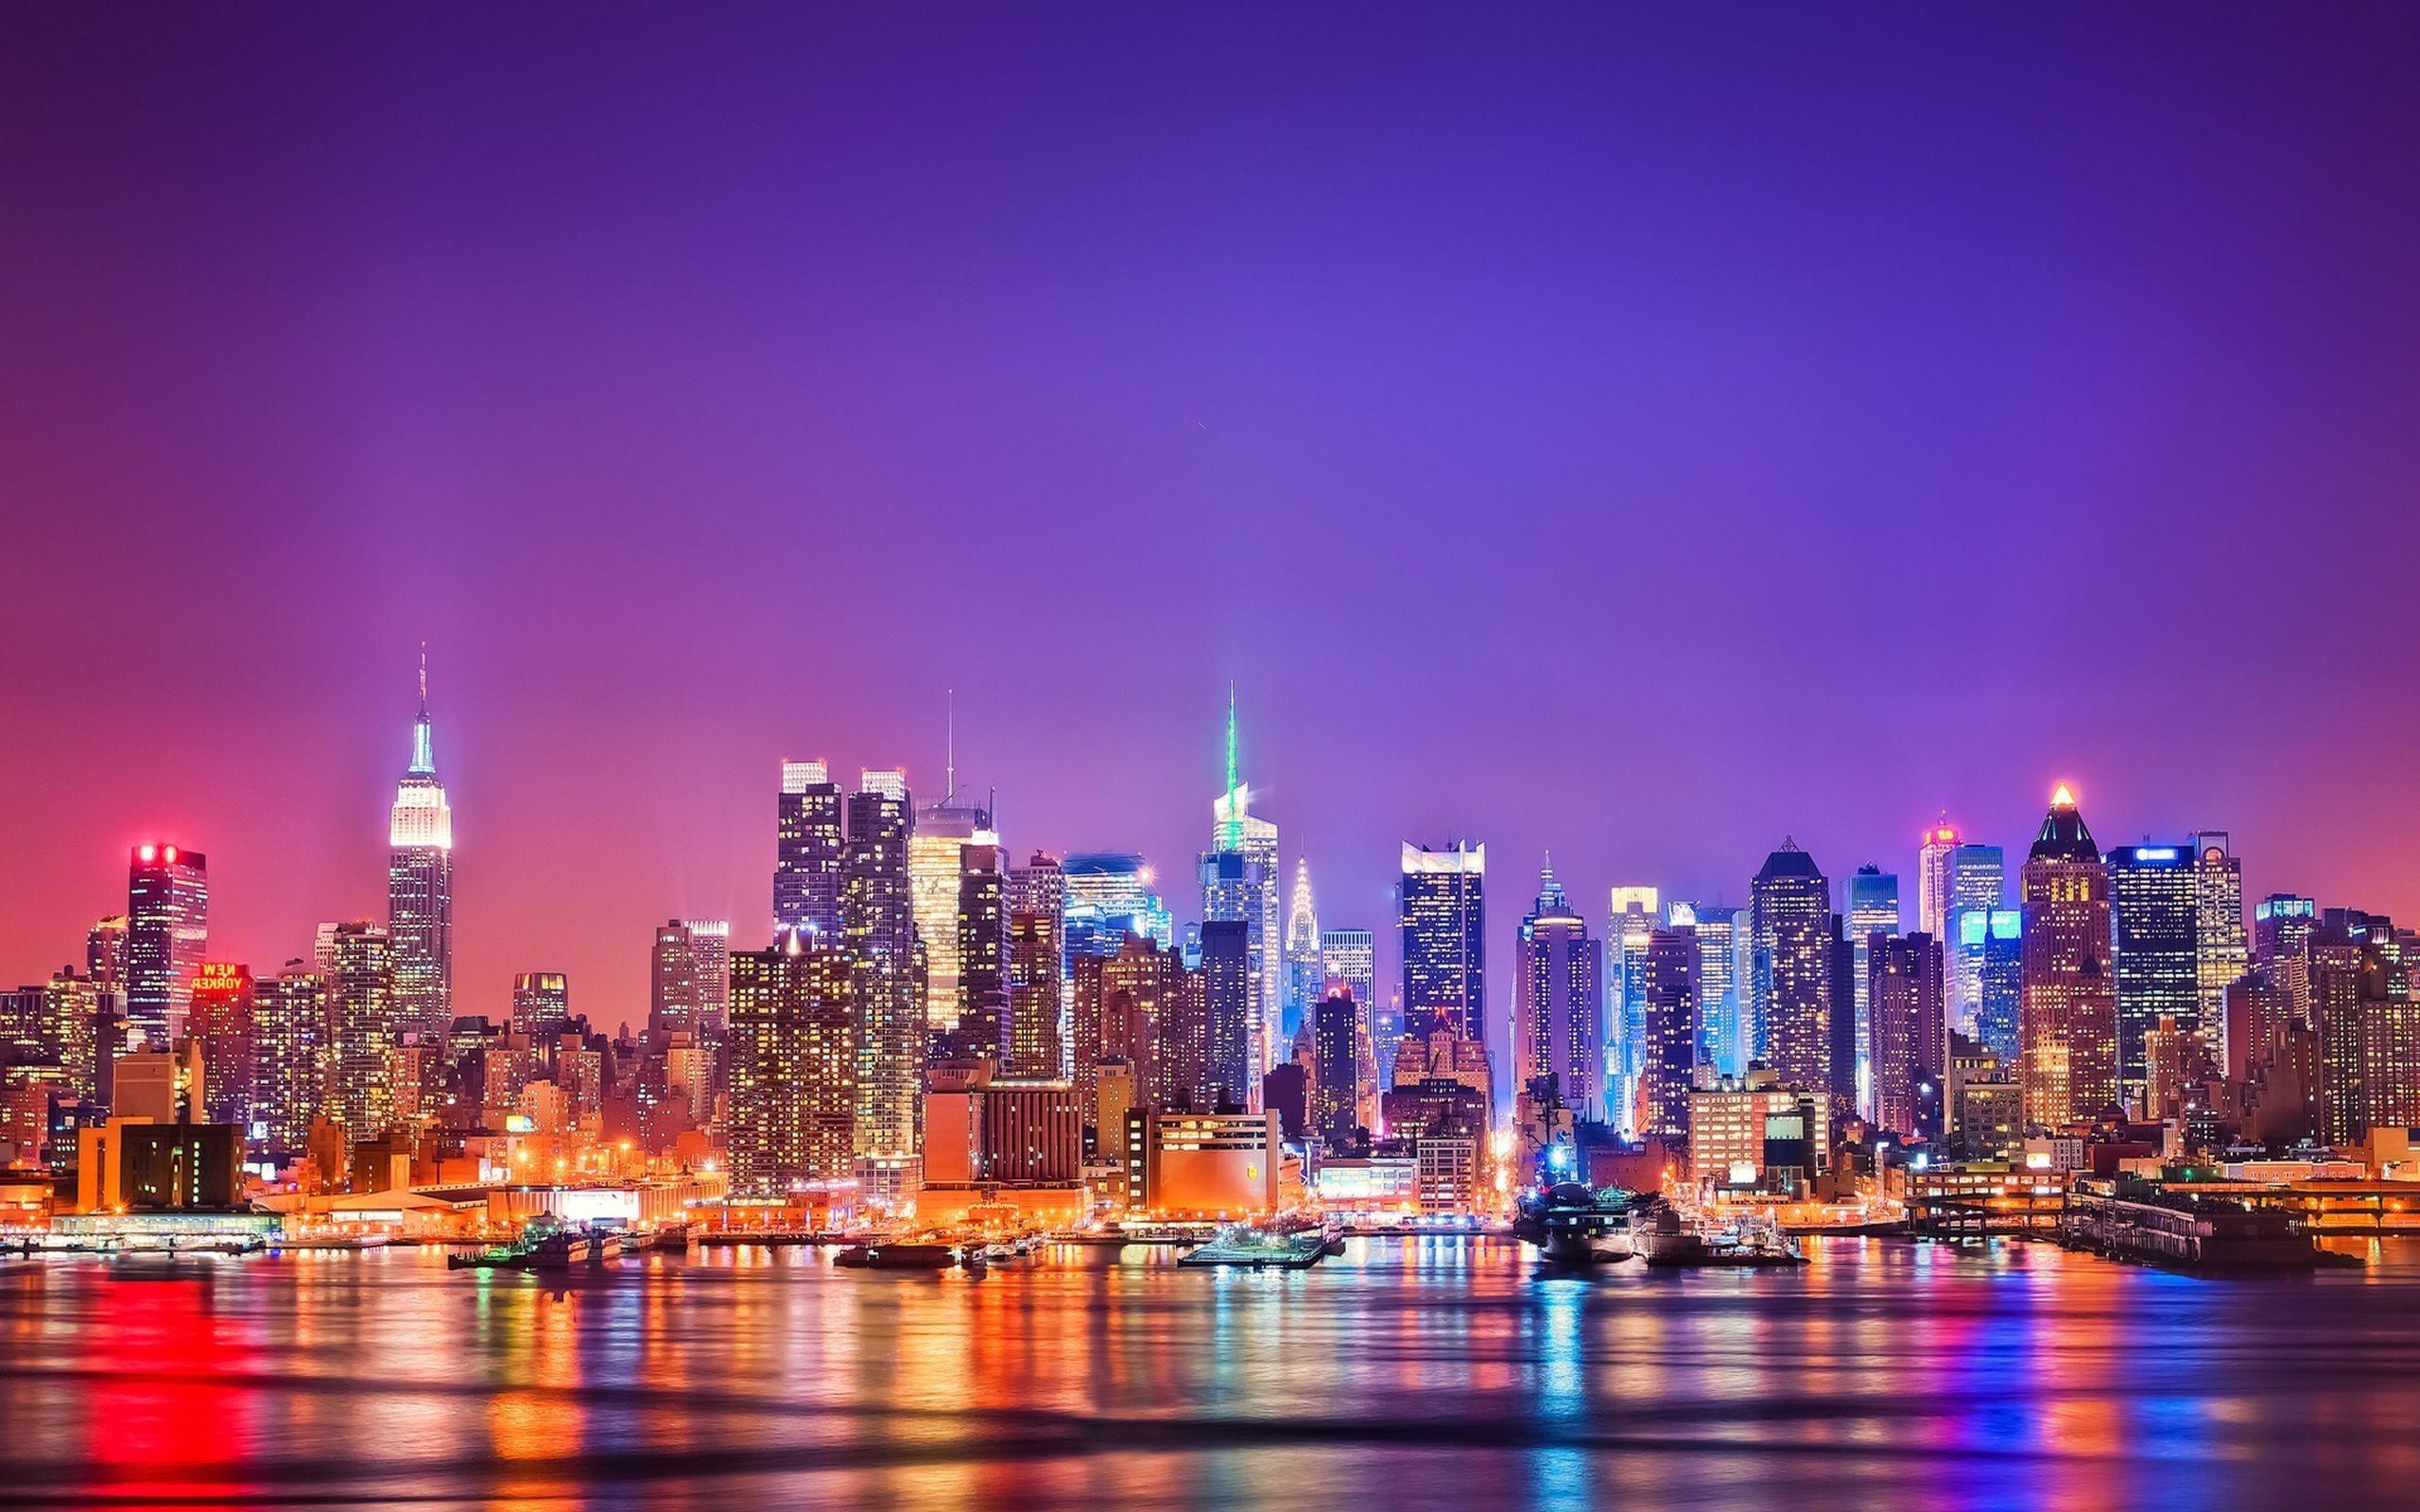 Free download New York City Skyline HD Wallpaper Desktop ...